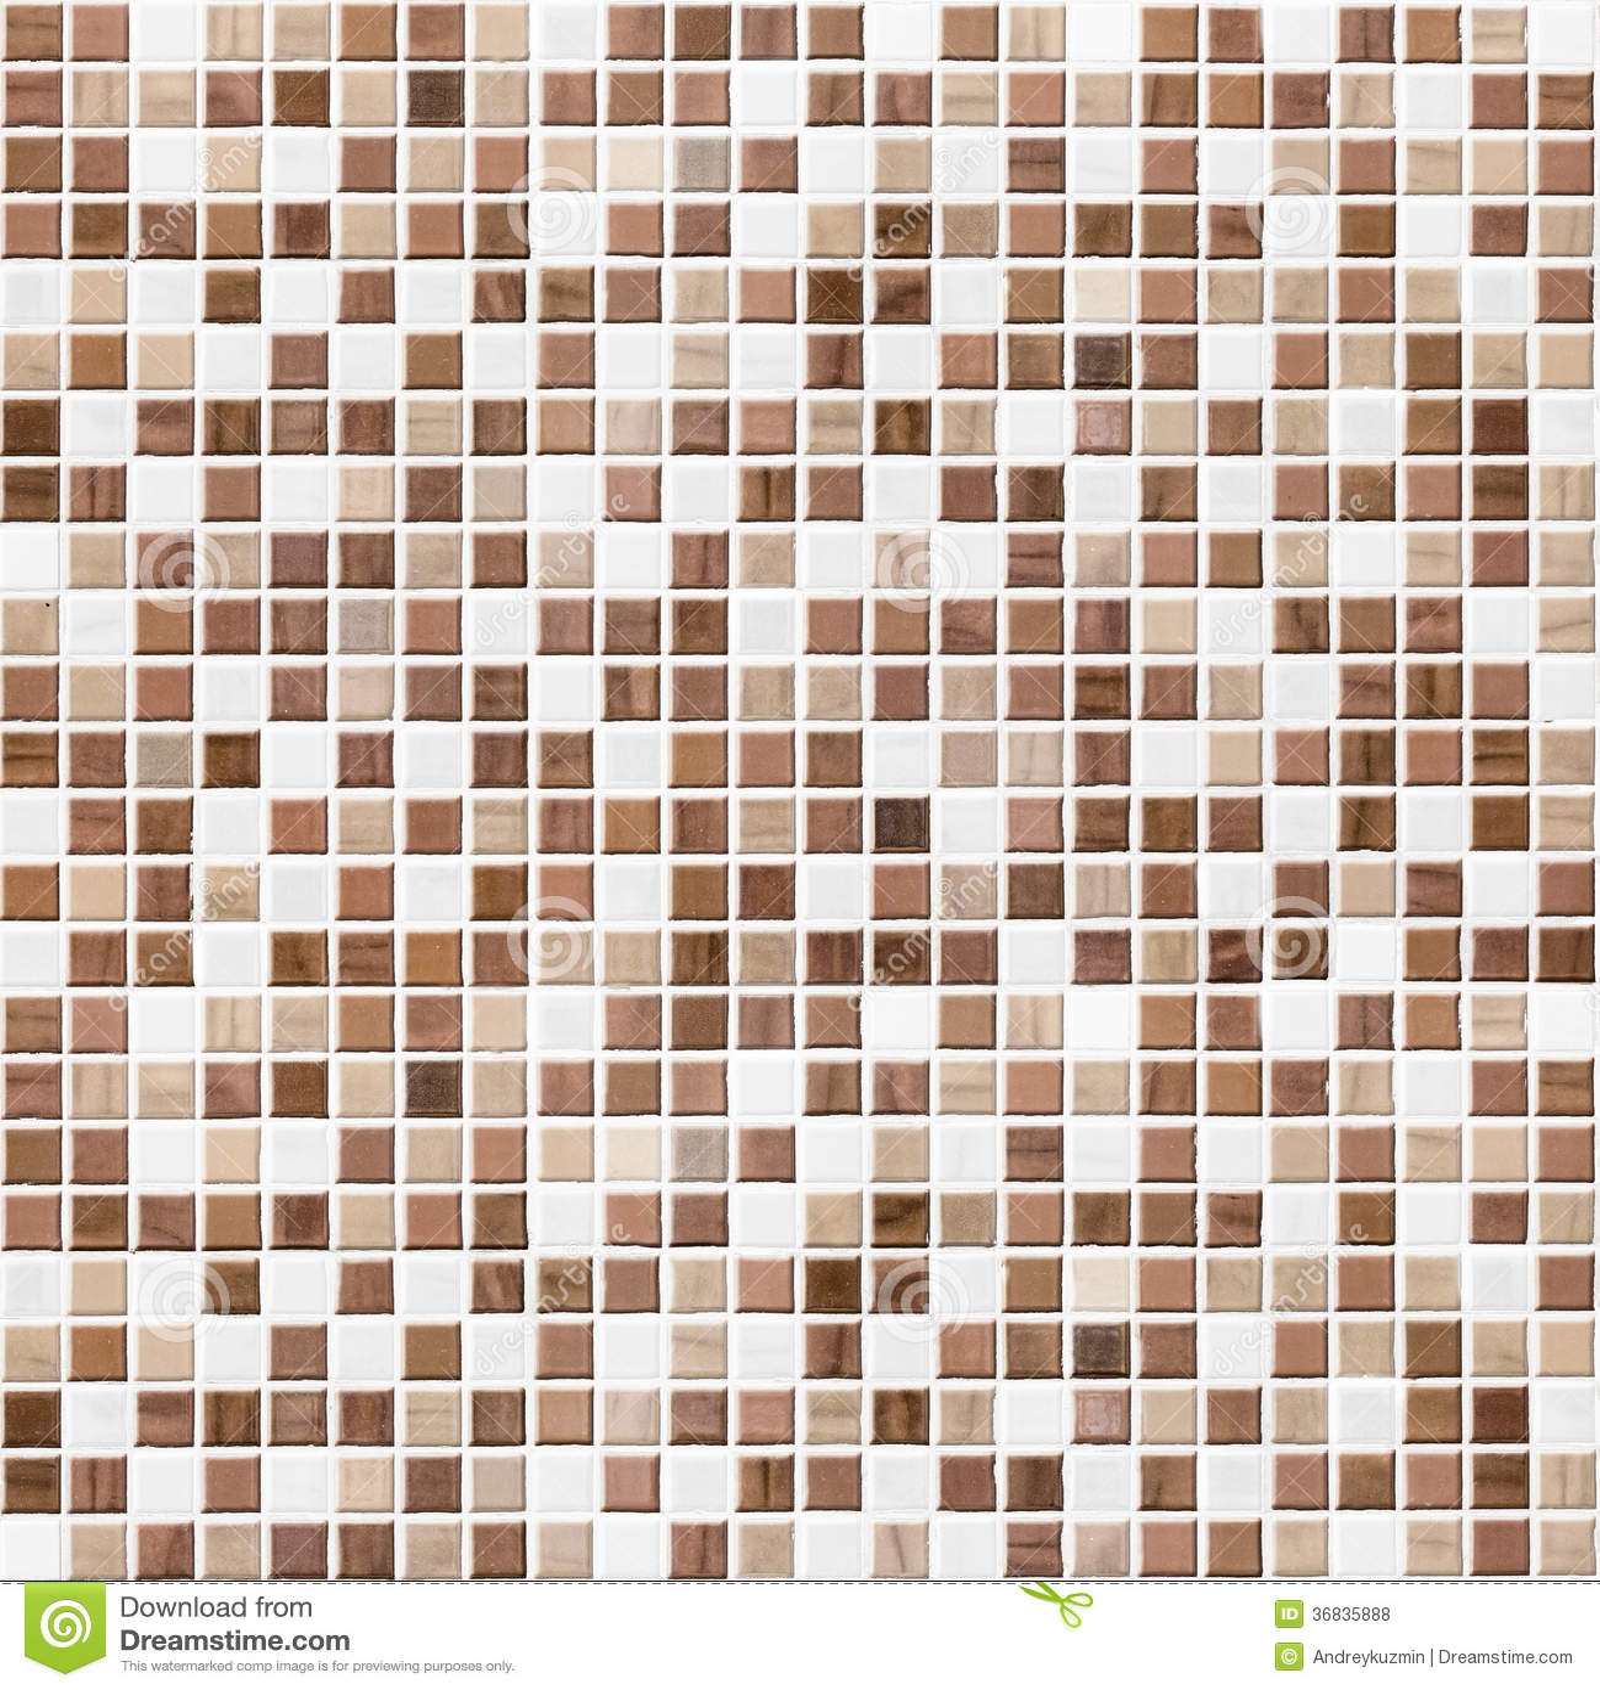 Brown Tiled Bathroom Kitchen Or Toilet Tile Wall